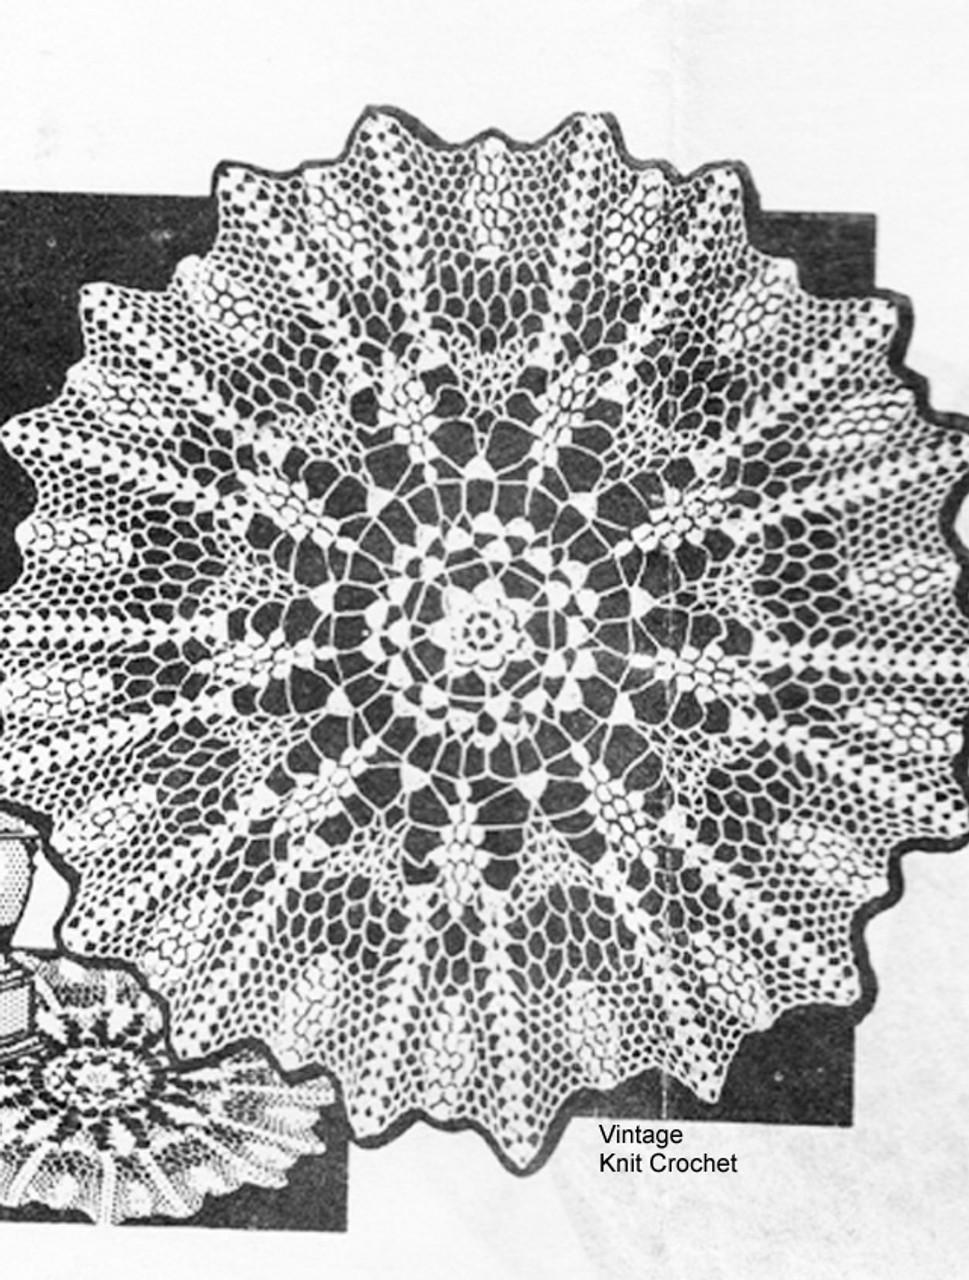 Vintage Grape Cluster Crochet Doily Pattern, Anne Cabot 2721